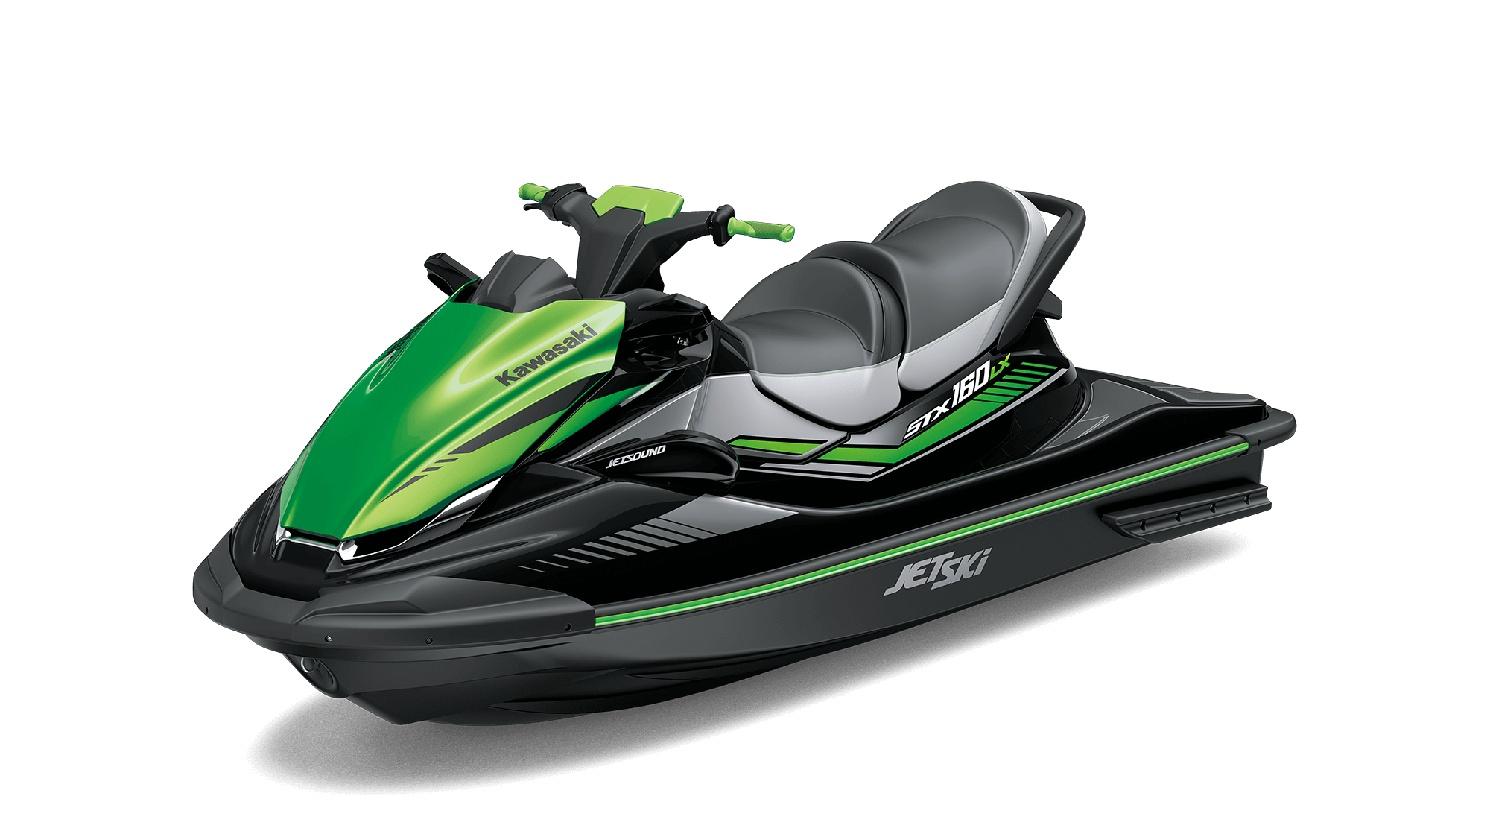 Kawasaki JET SKI STX-160LX Ébène / Vert Lime Bonbon 2020